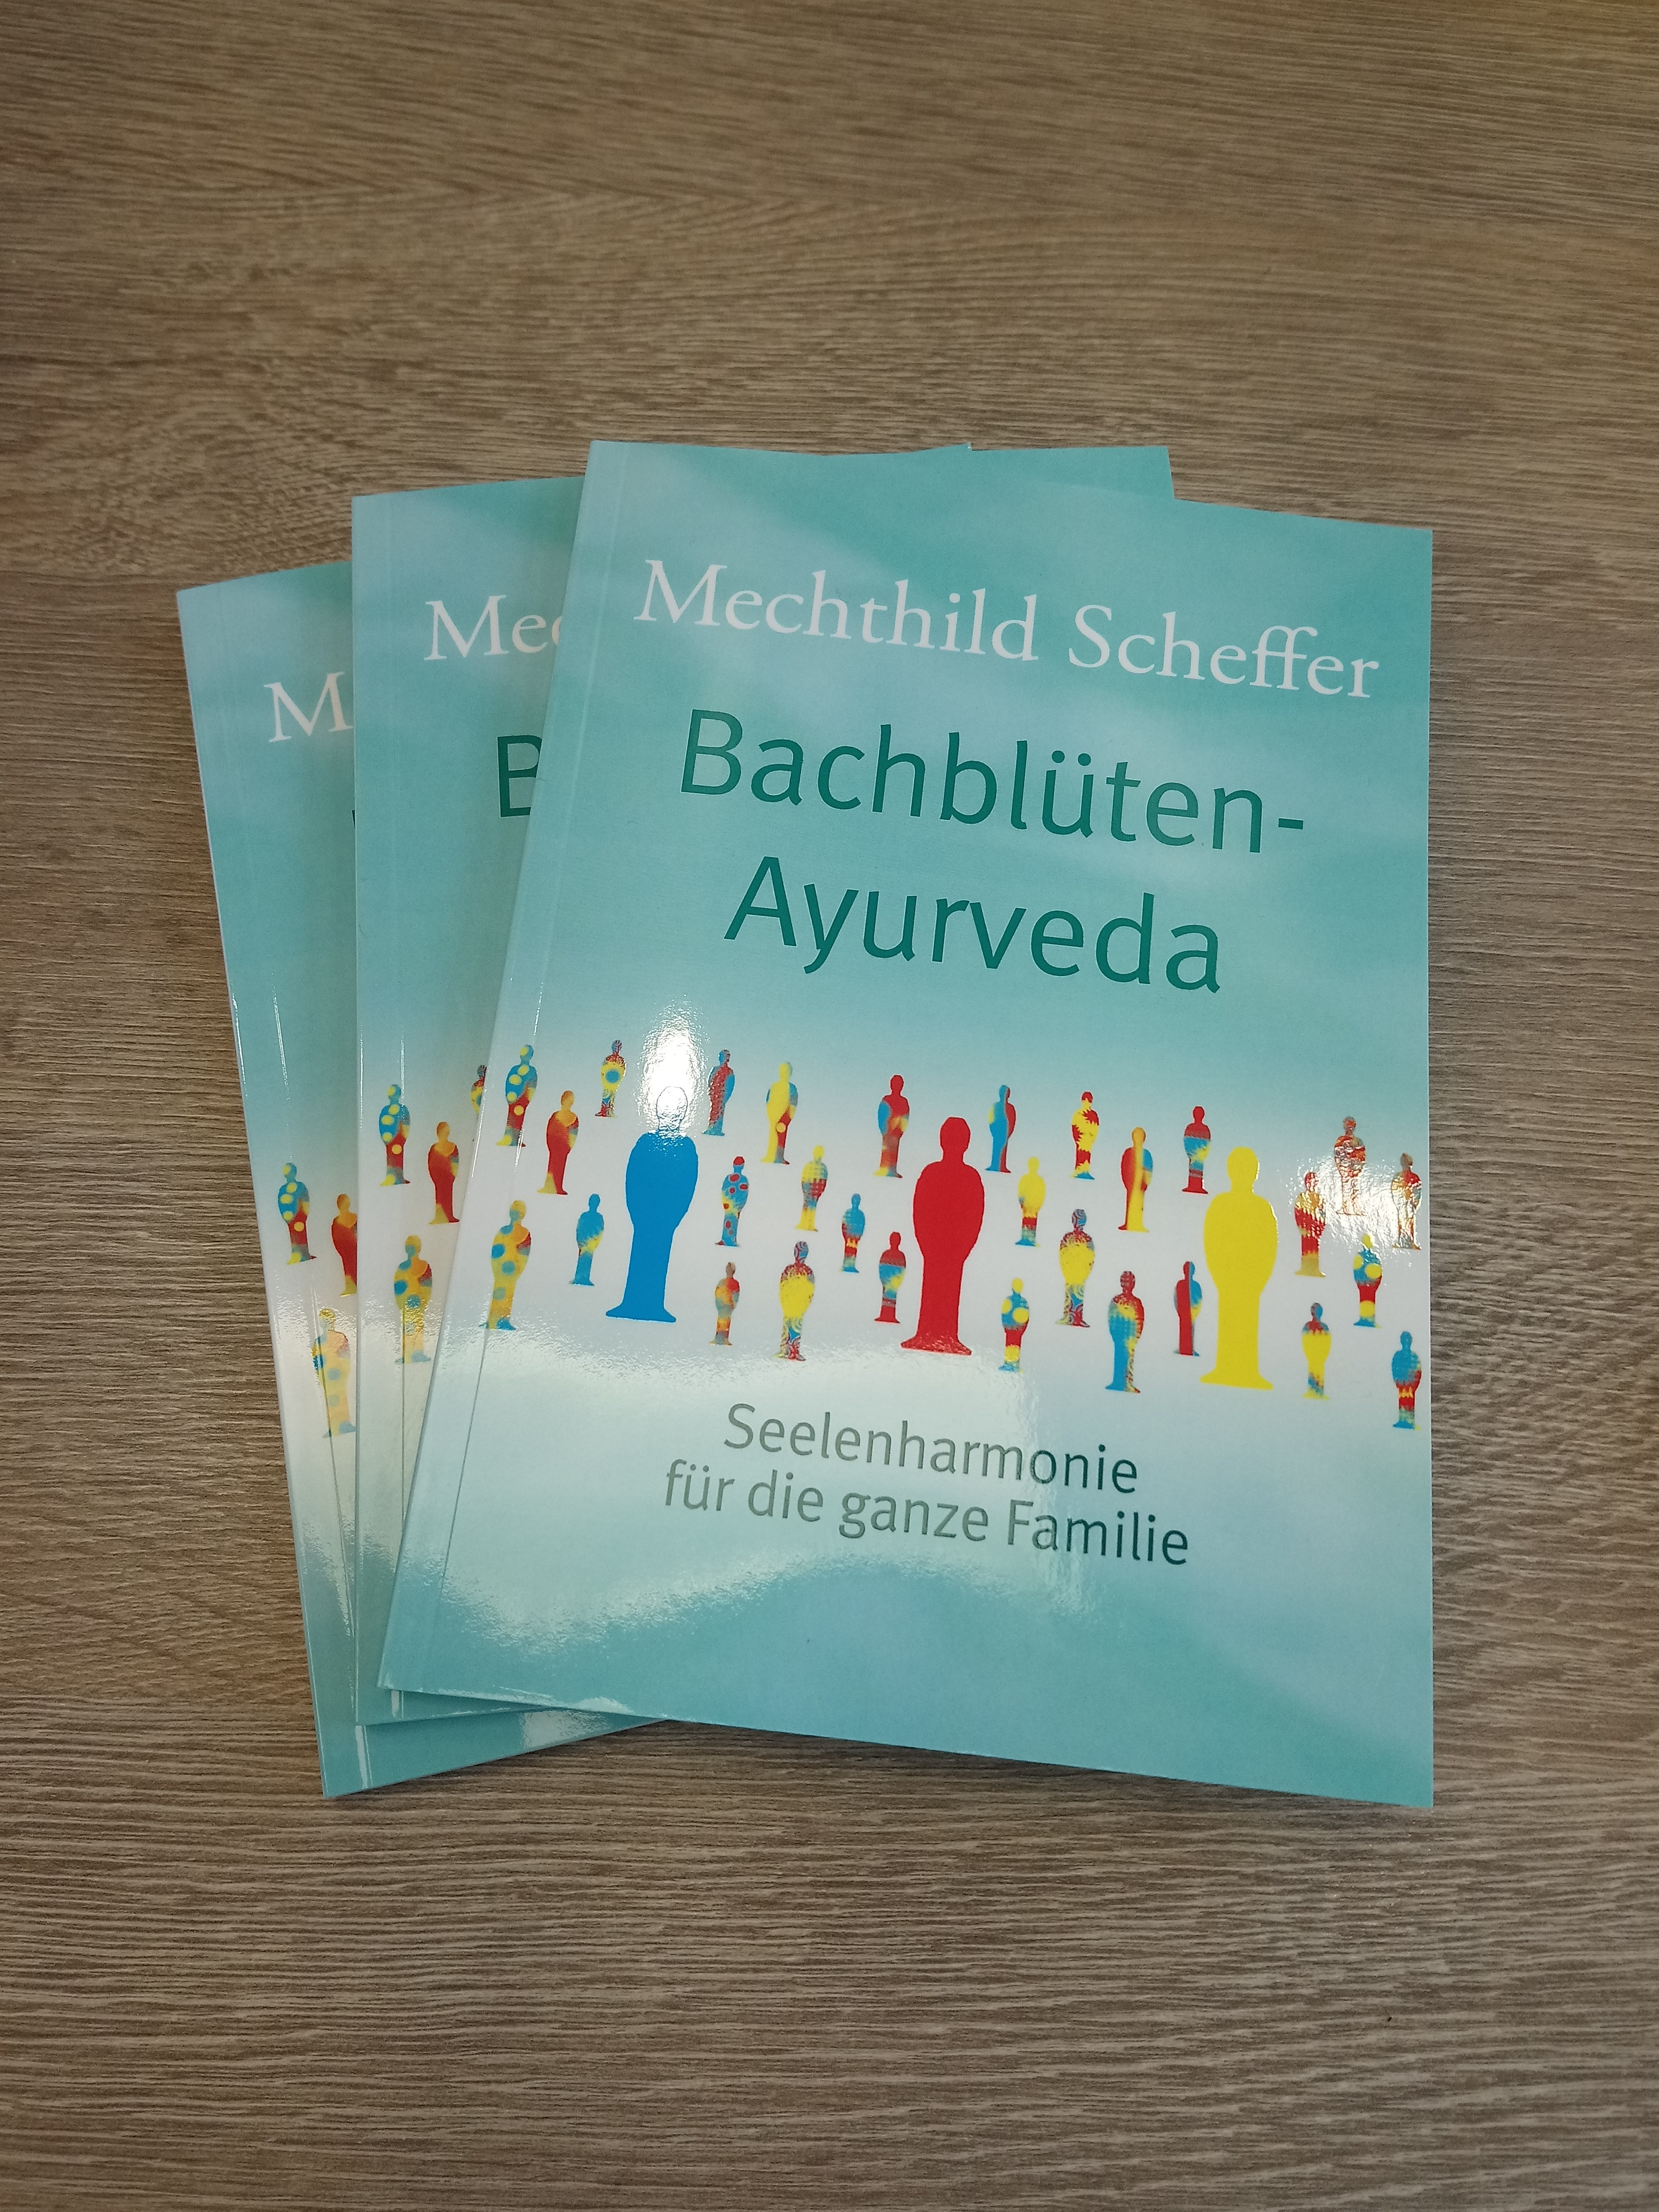 Mechthild Scheffer - Buch - Bachblüten-Ayurveda